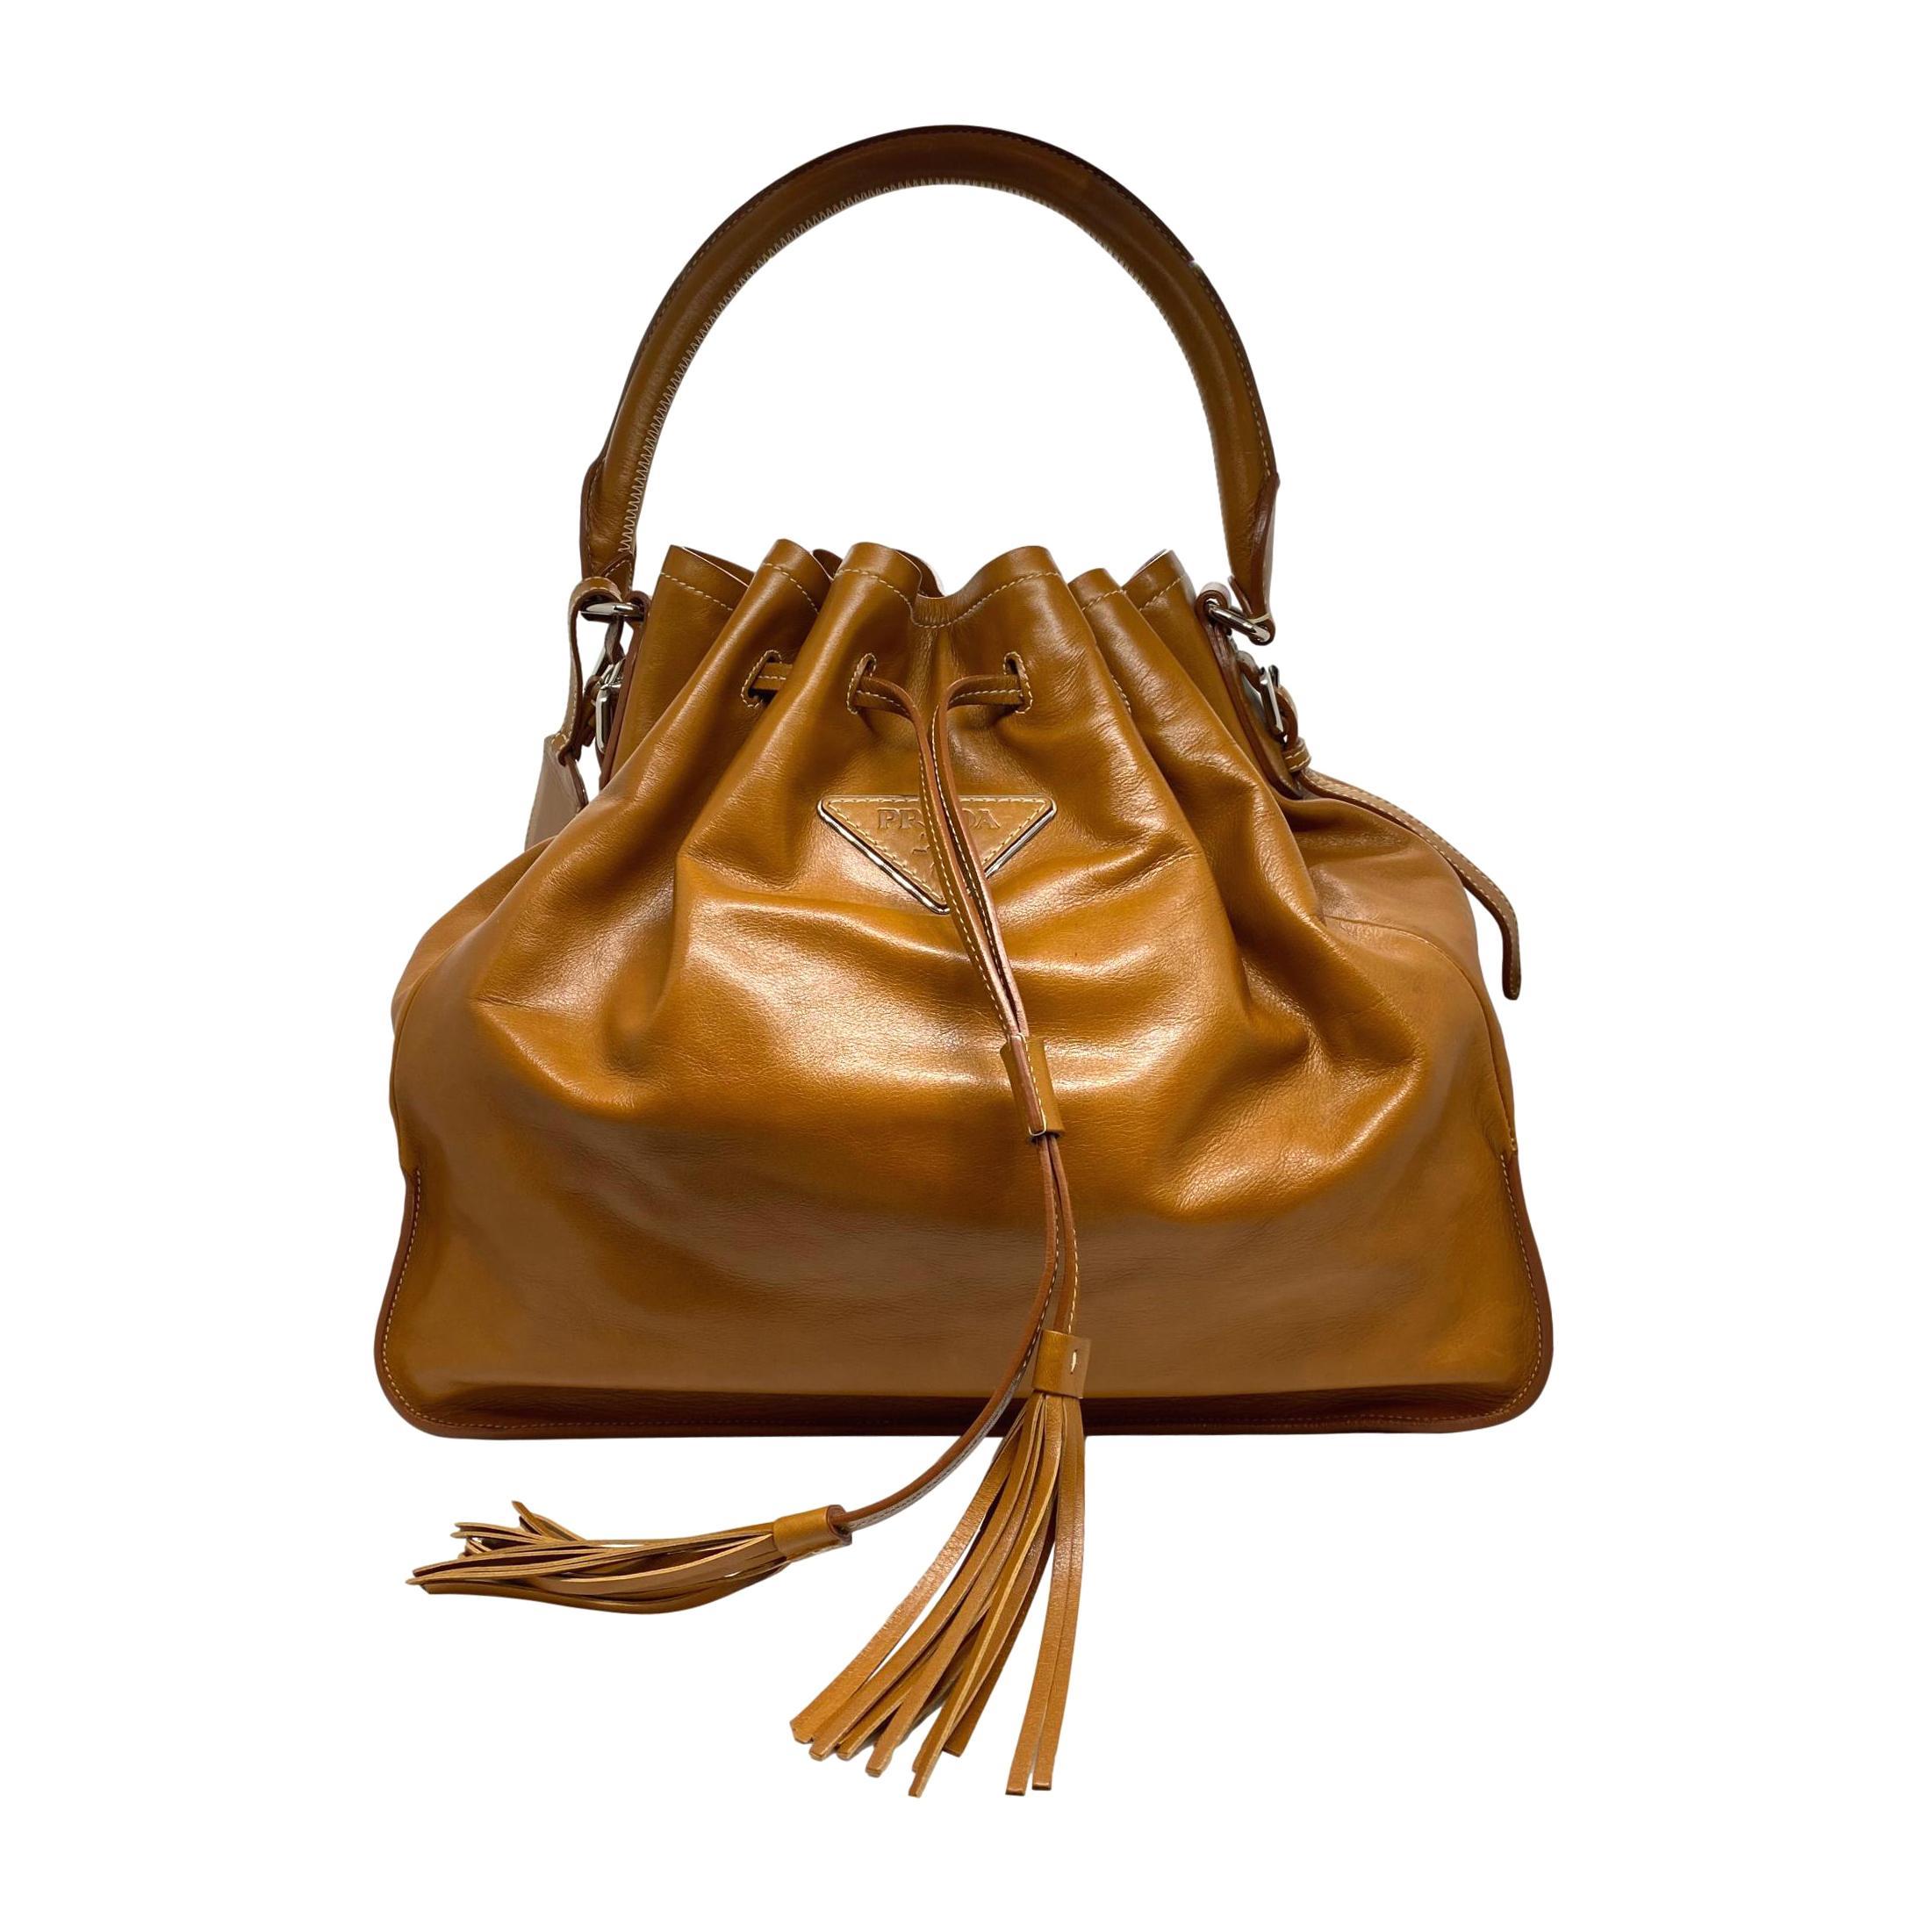 Prada Nappa Leather Drawstring Shoulder Top Handle Handbag, 2010.